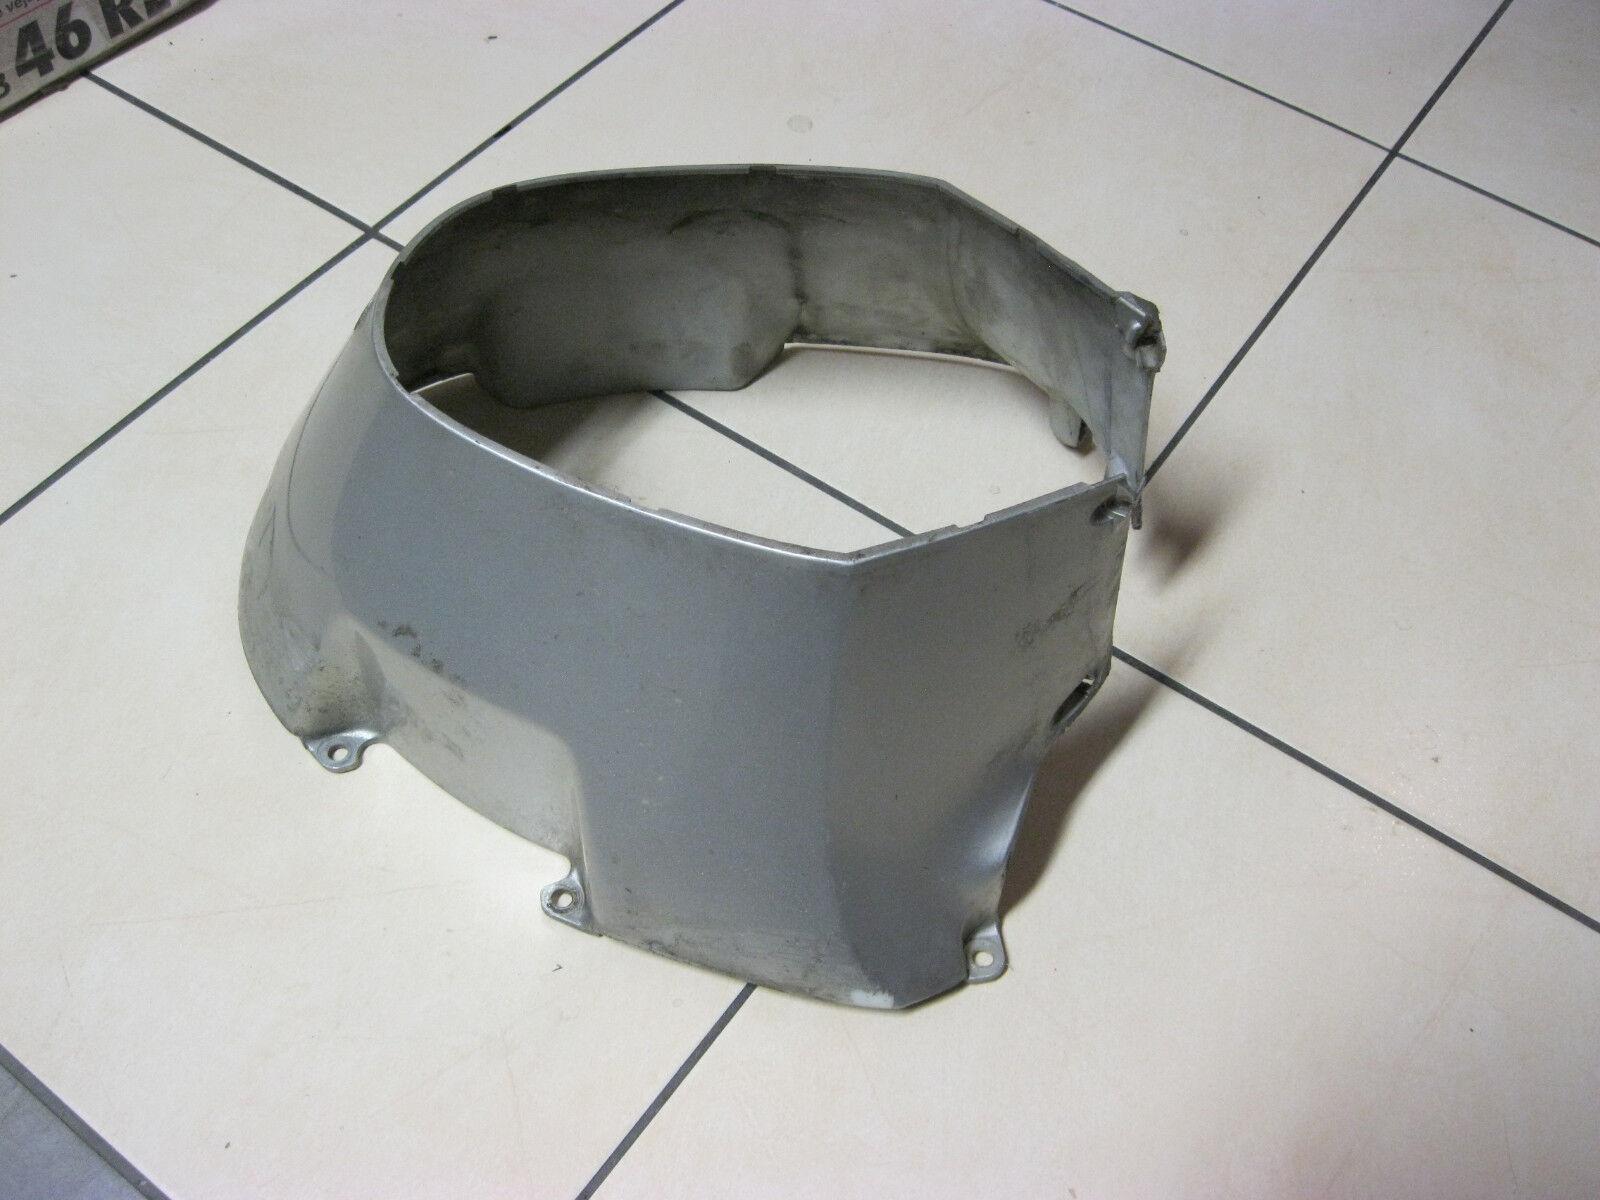 Verkleidung Motorverkleidung für Außenbord Motor Motor Motor Honda BF50 A 3e1795